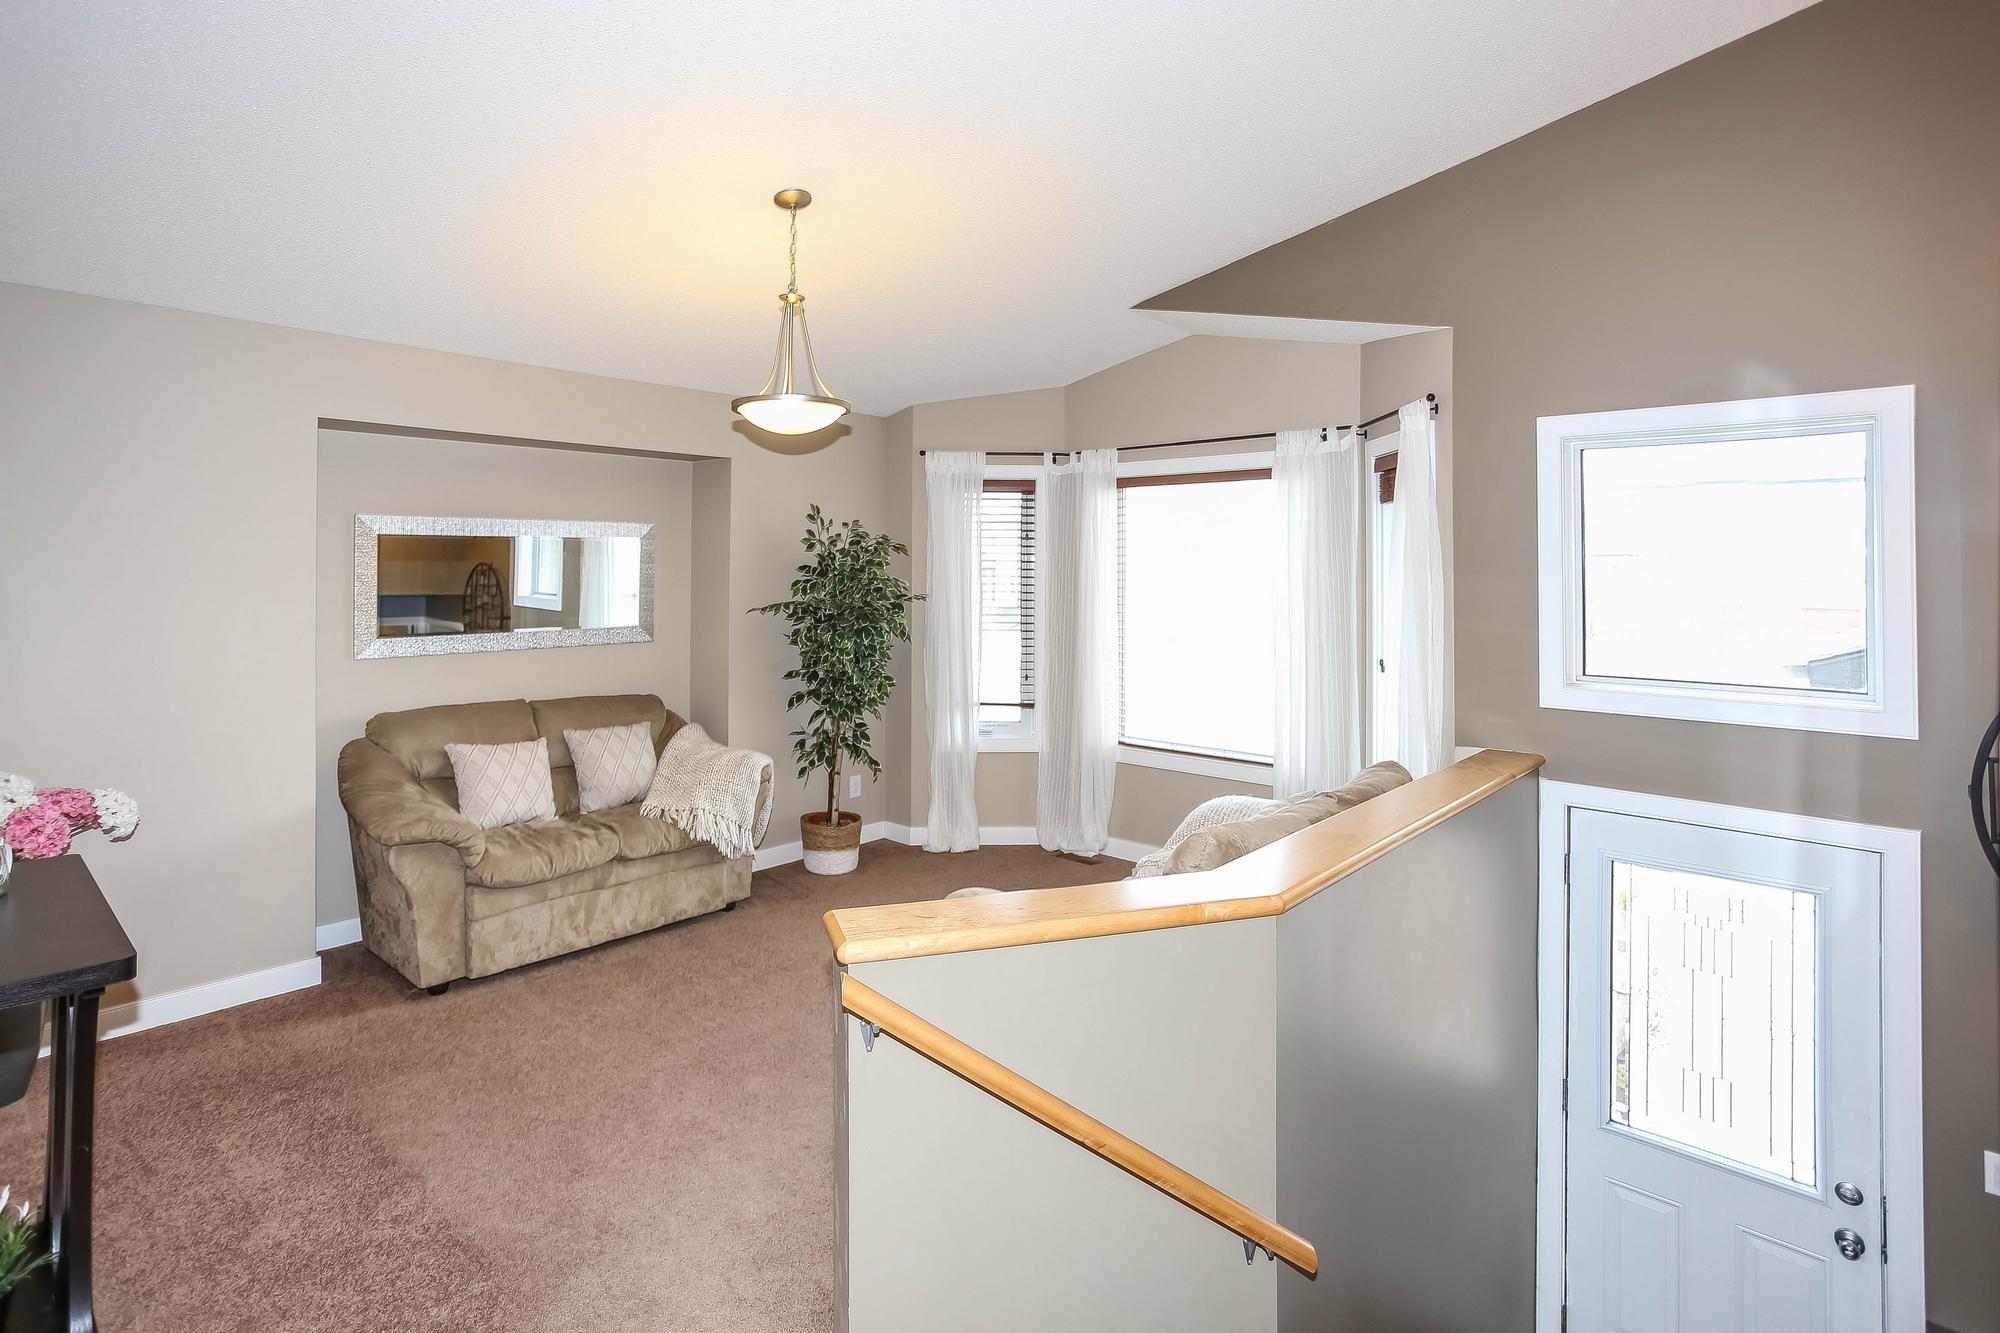 151 Kingfisher Crescent, Winnipeg, Manitoba  R3Y 1S3 - Photo 3 - 202008673